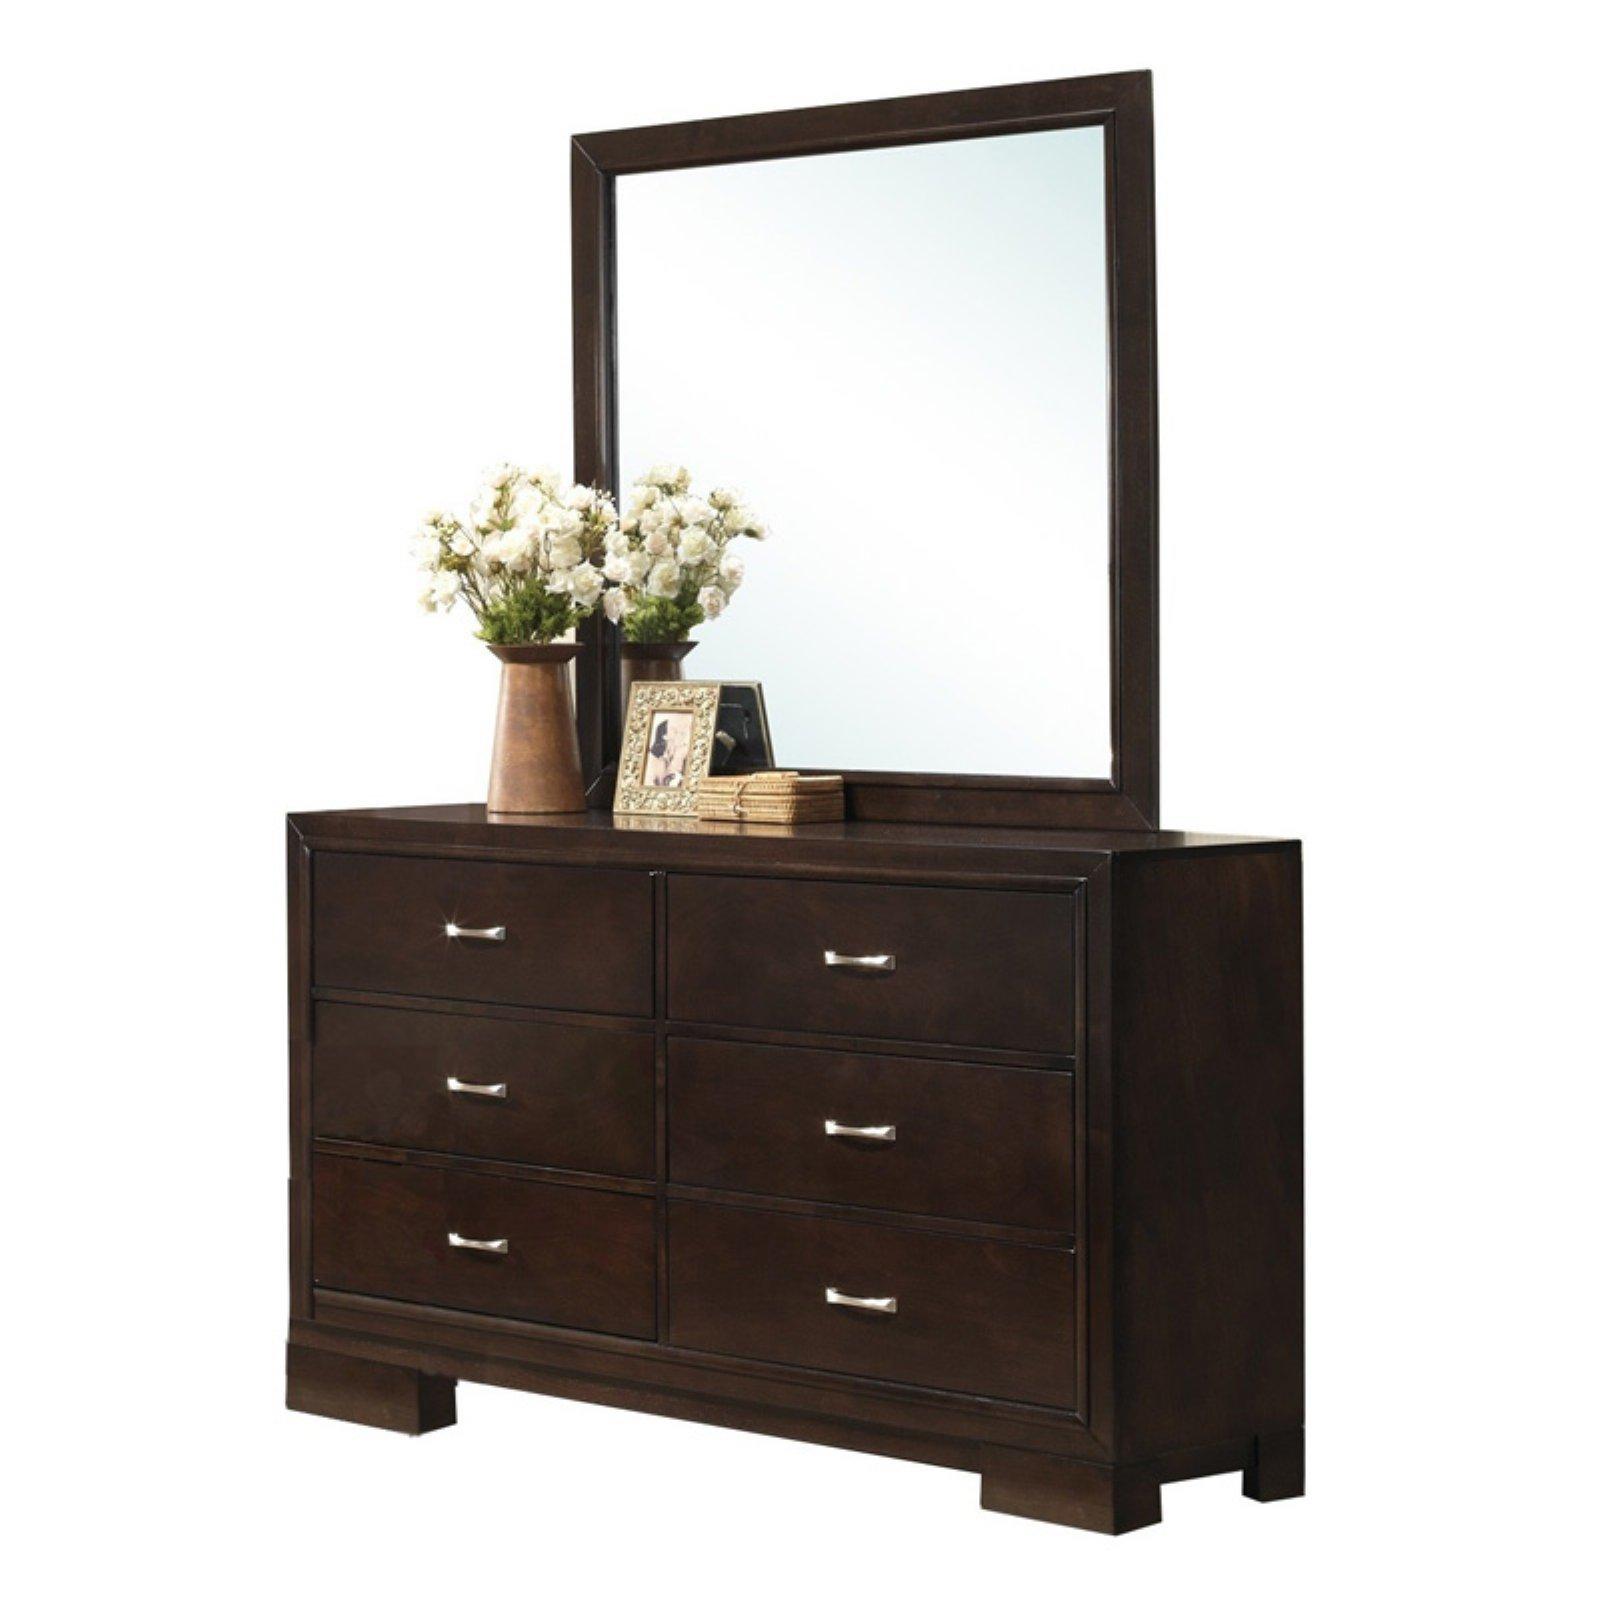 Roundhill Furniture Montana 6 Drawer Dresser